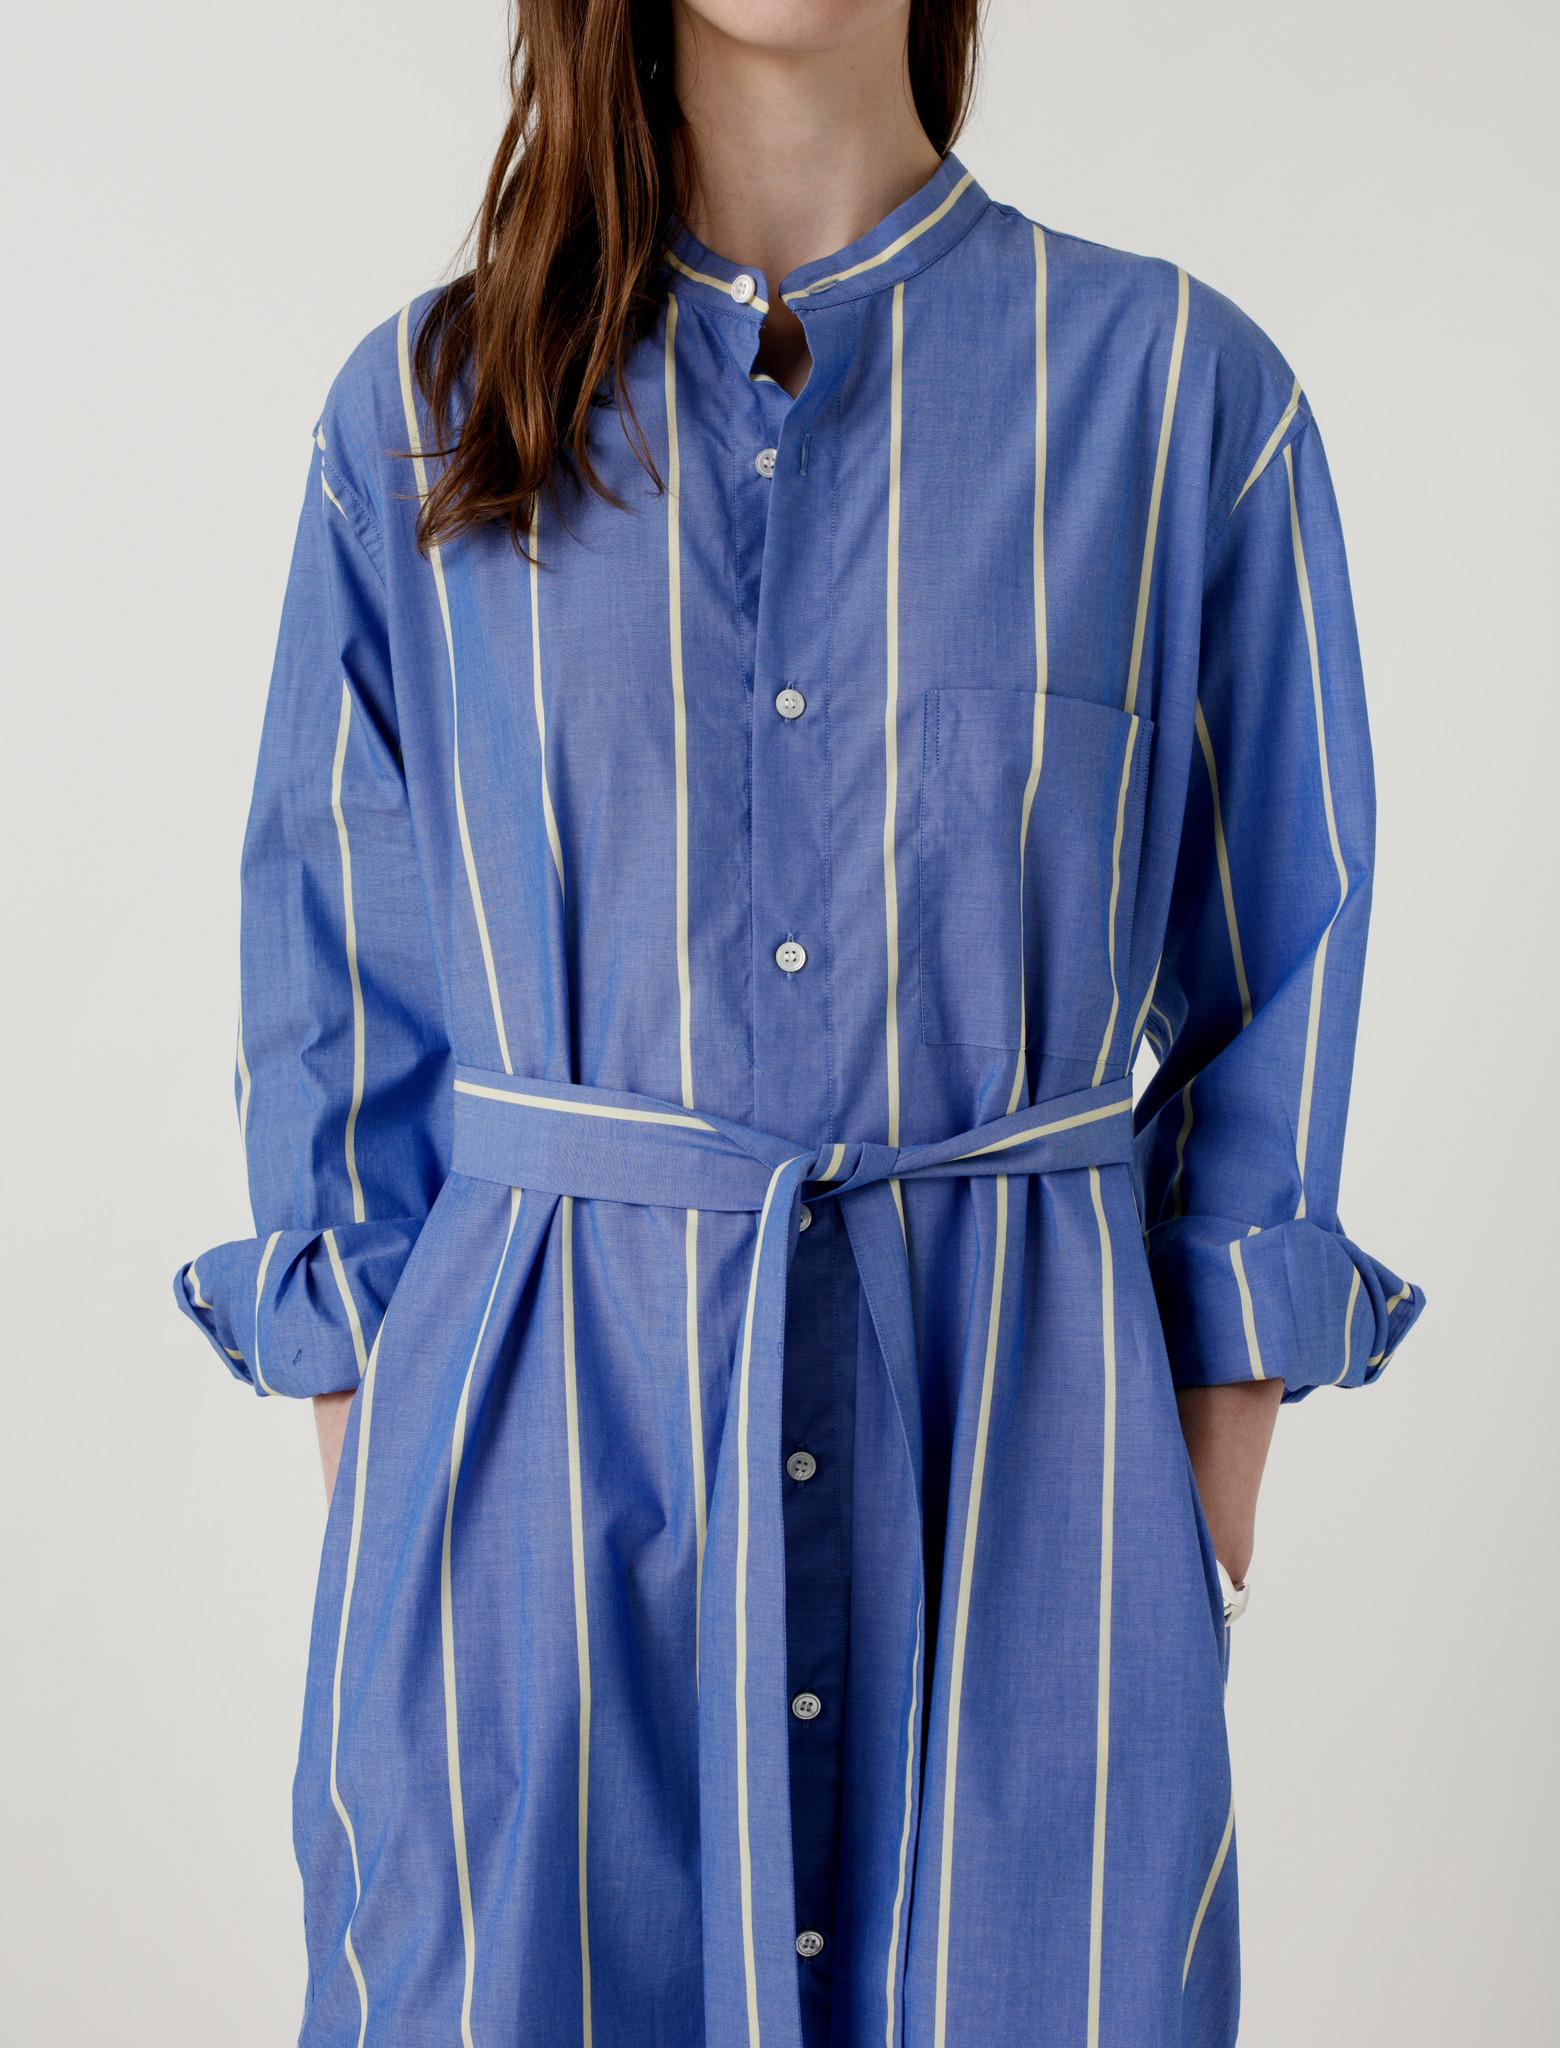 Cristaseya maxi mao shirt blue and yellow stripes garmentory for Blue and yellow dress shirt